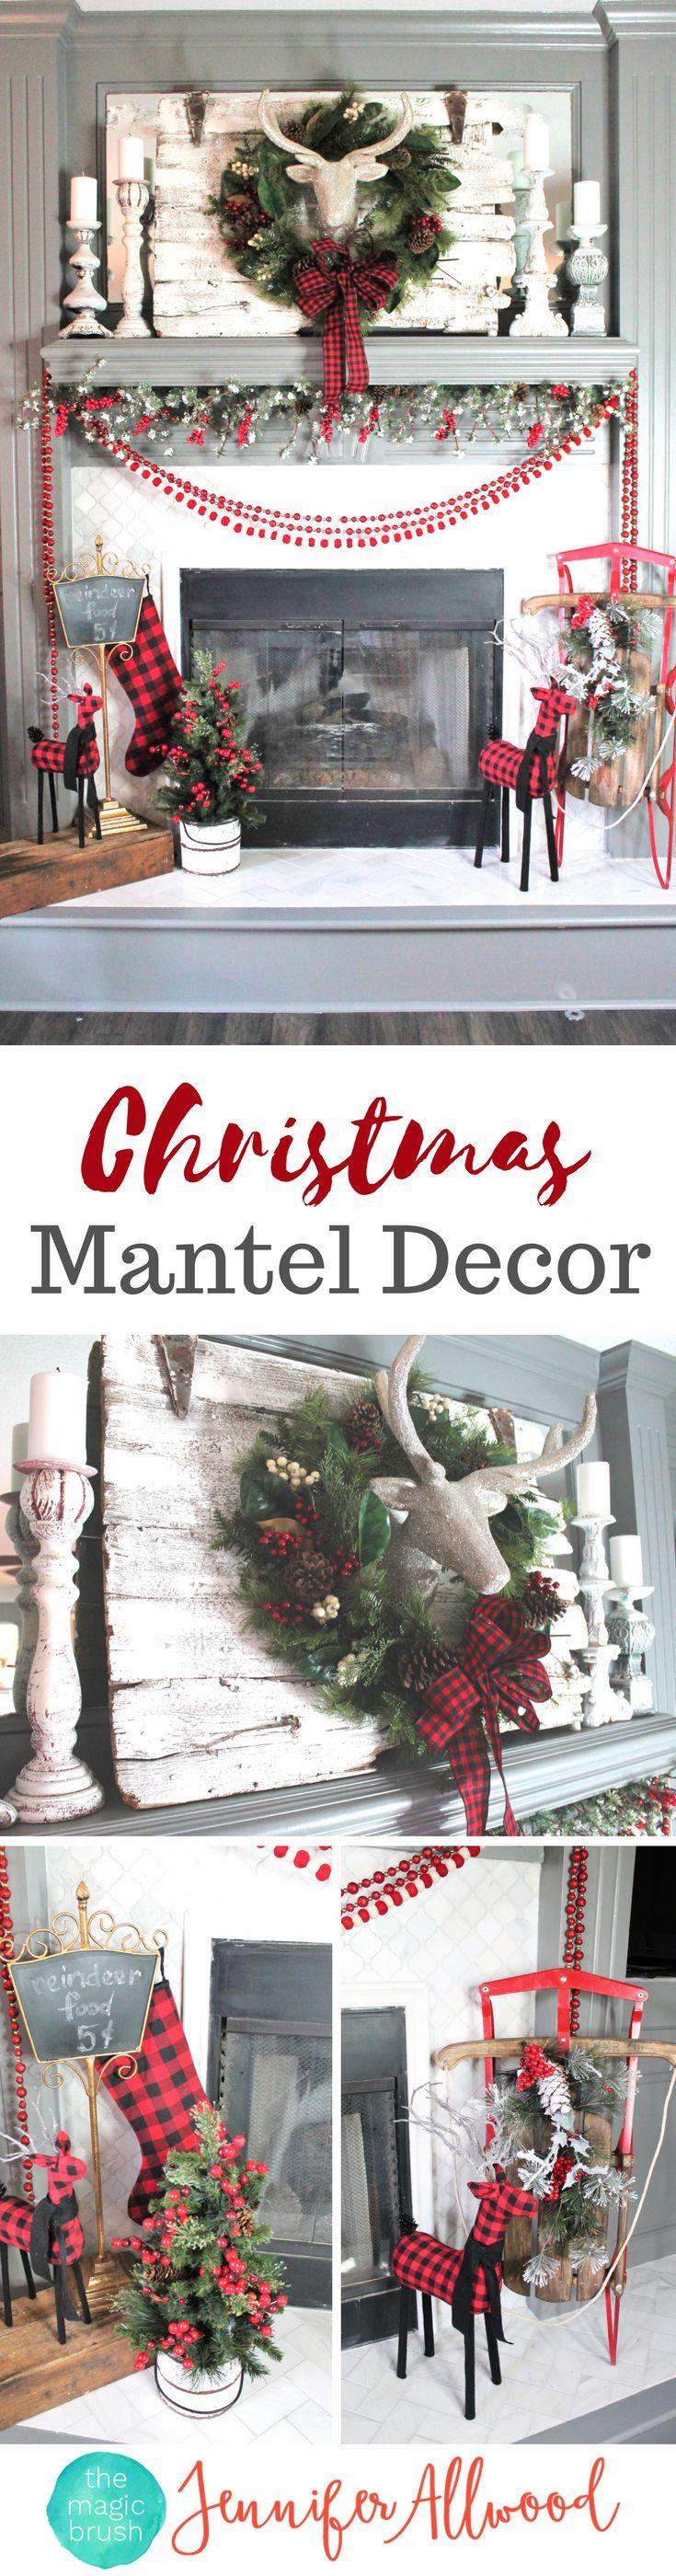 Christmas Mantel Decorations and Ideas | Magic Brush | Christmas Decor Ideas | Christmas Decorations with Glitter Dear Head and Christmas Tartan & Buffalo Check